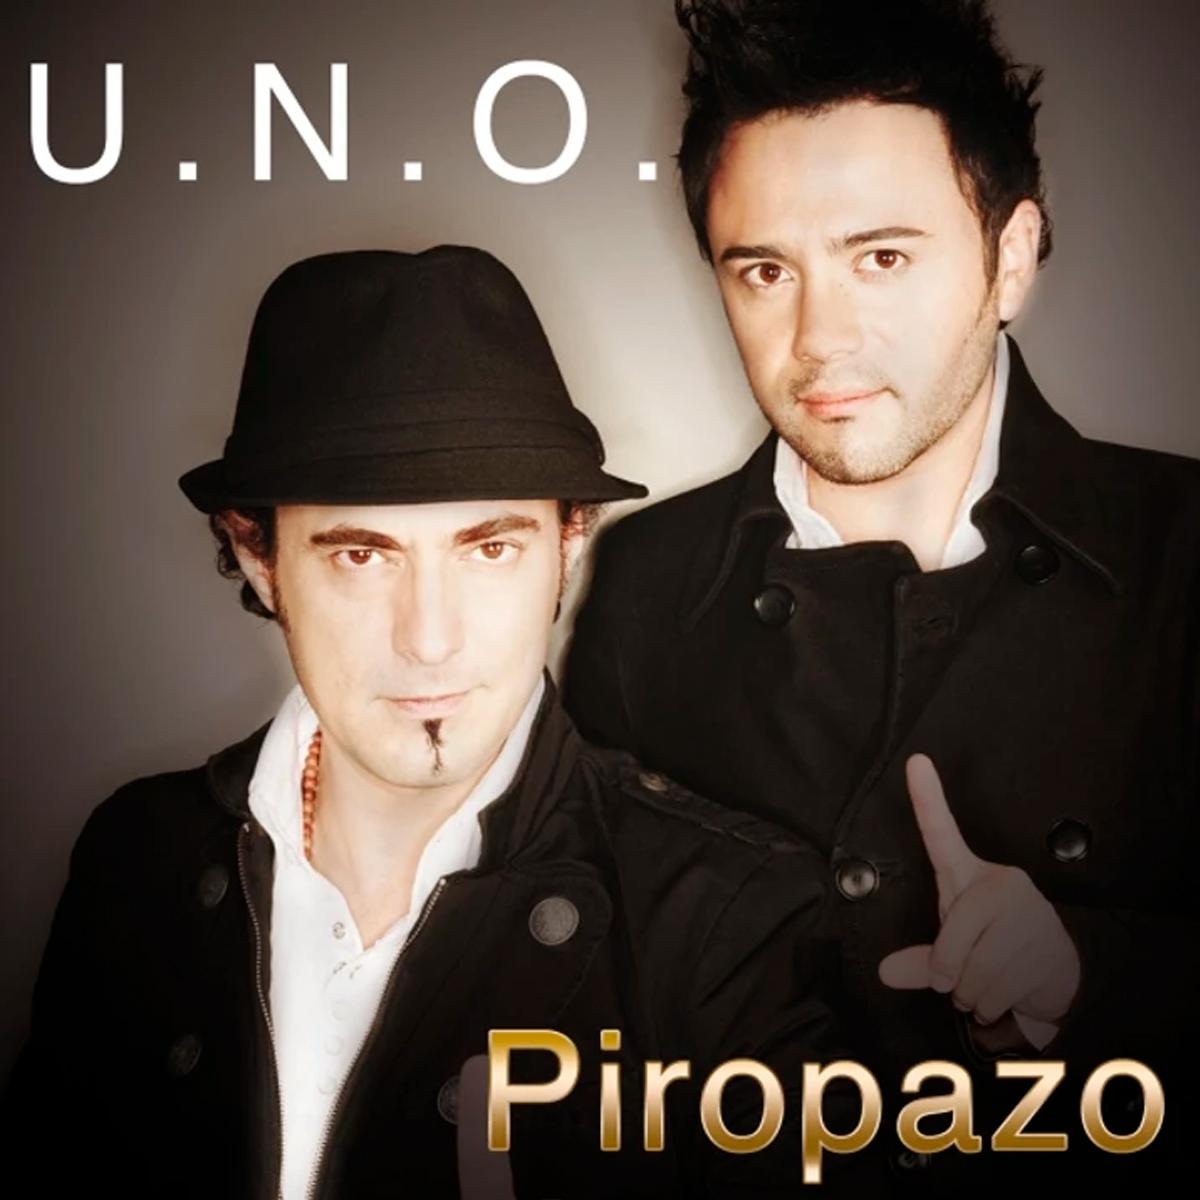 Piropazo